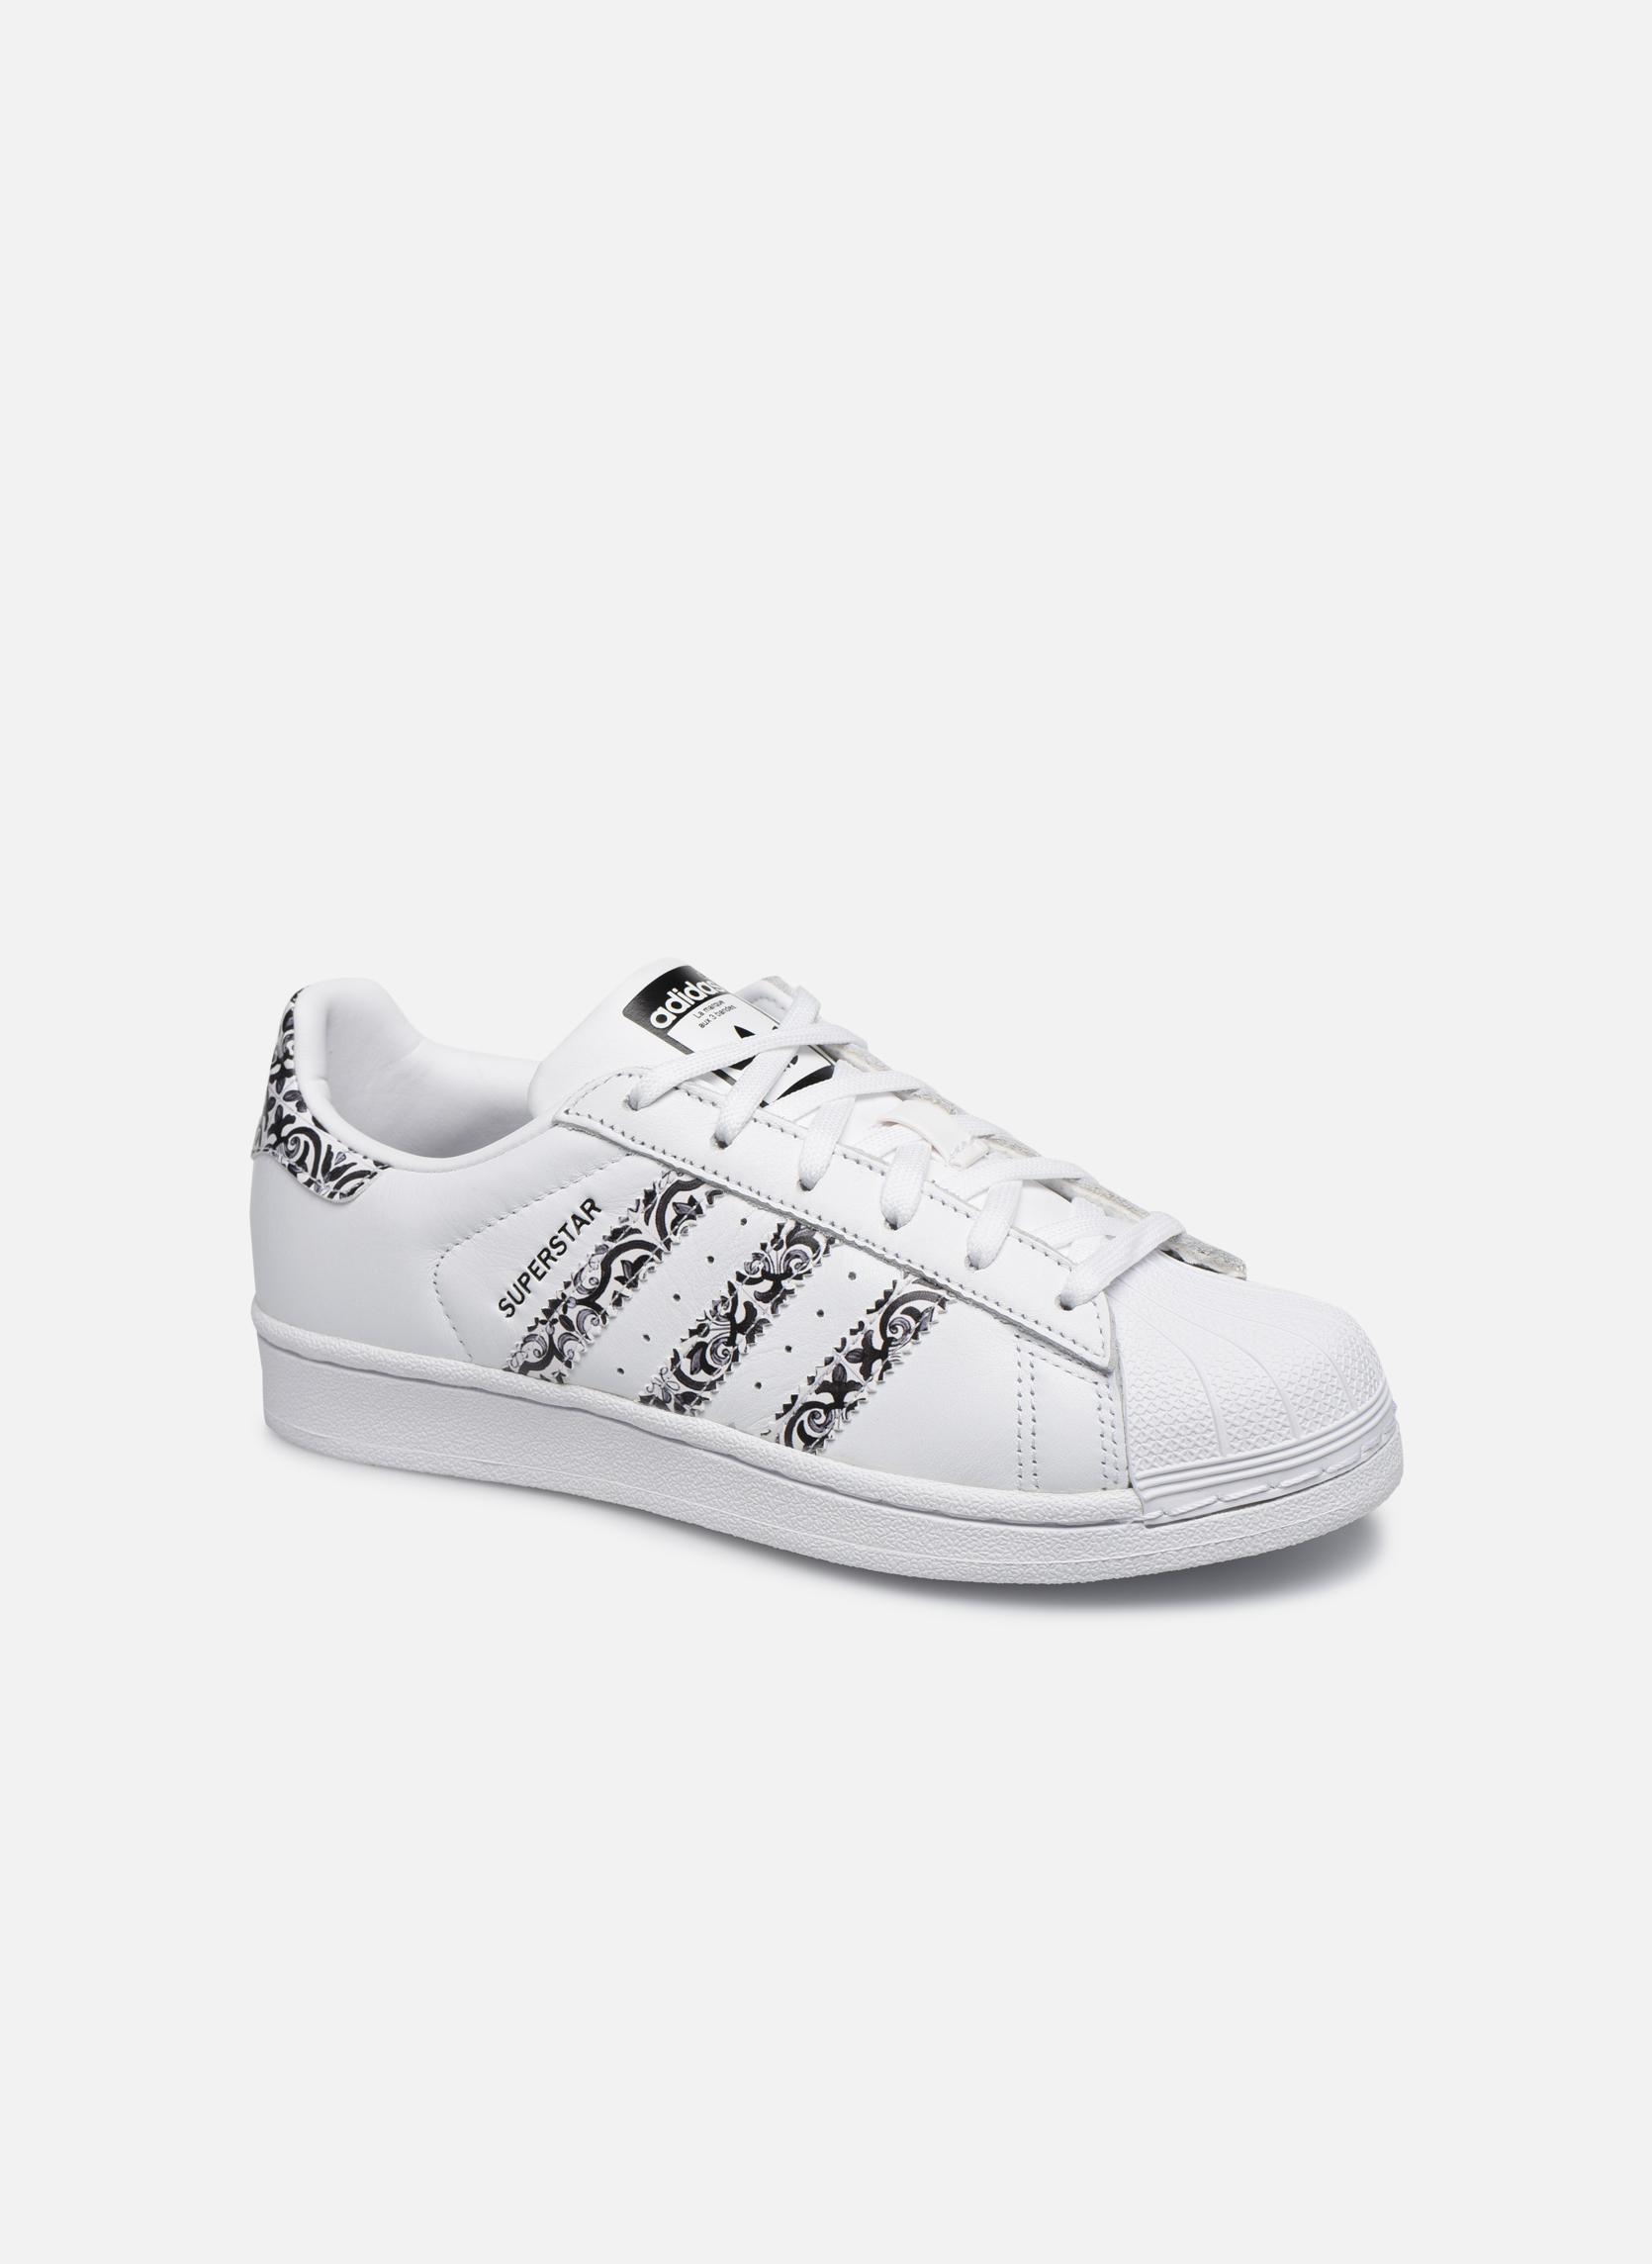 Baskets Adidas Originals Superstar W2 Blanc vue détail/paire